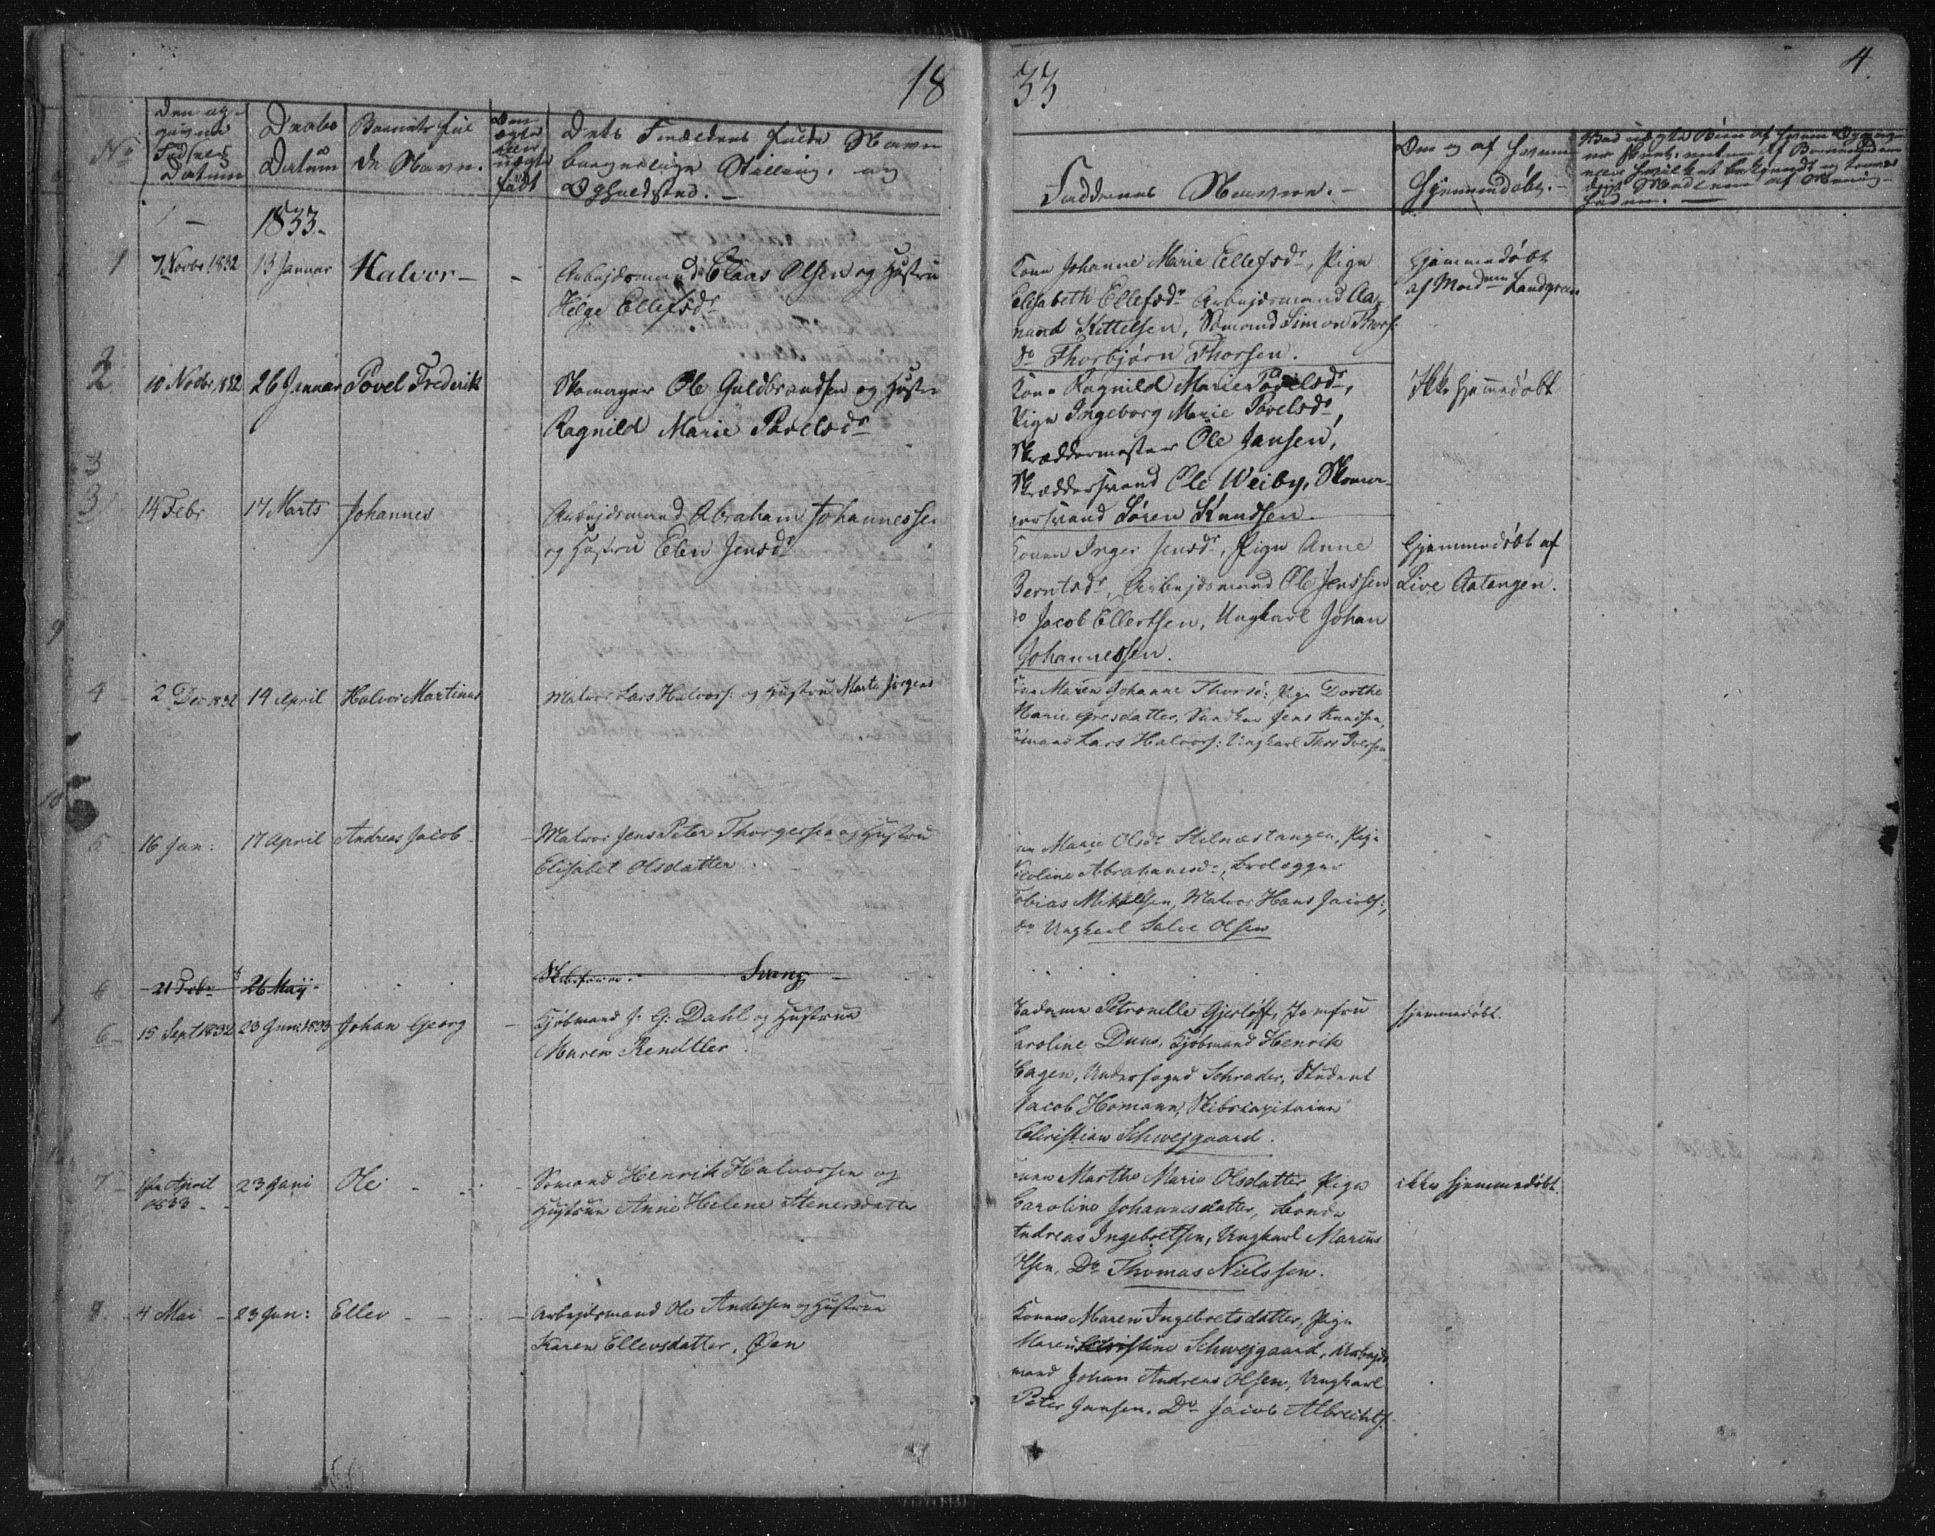 SAKO, Kragerø kirkebøker, F/Fa/L0005: Ministerialbok nr. 5, 1832-1847, s. 4